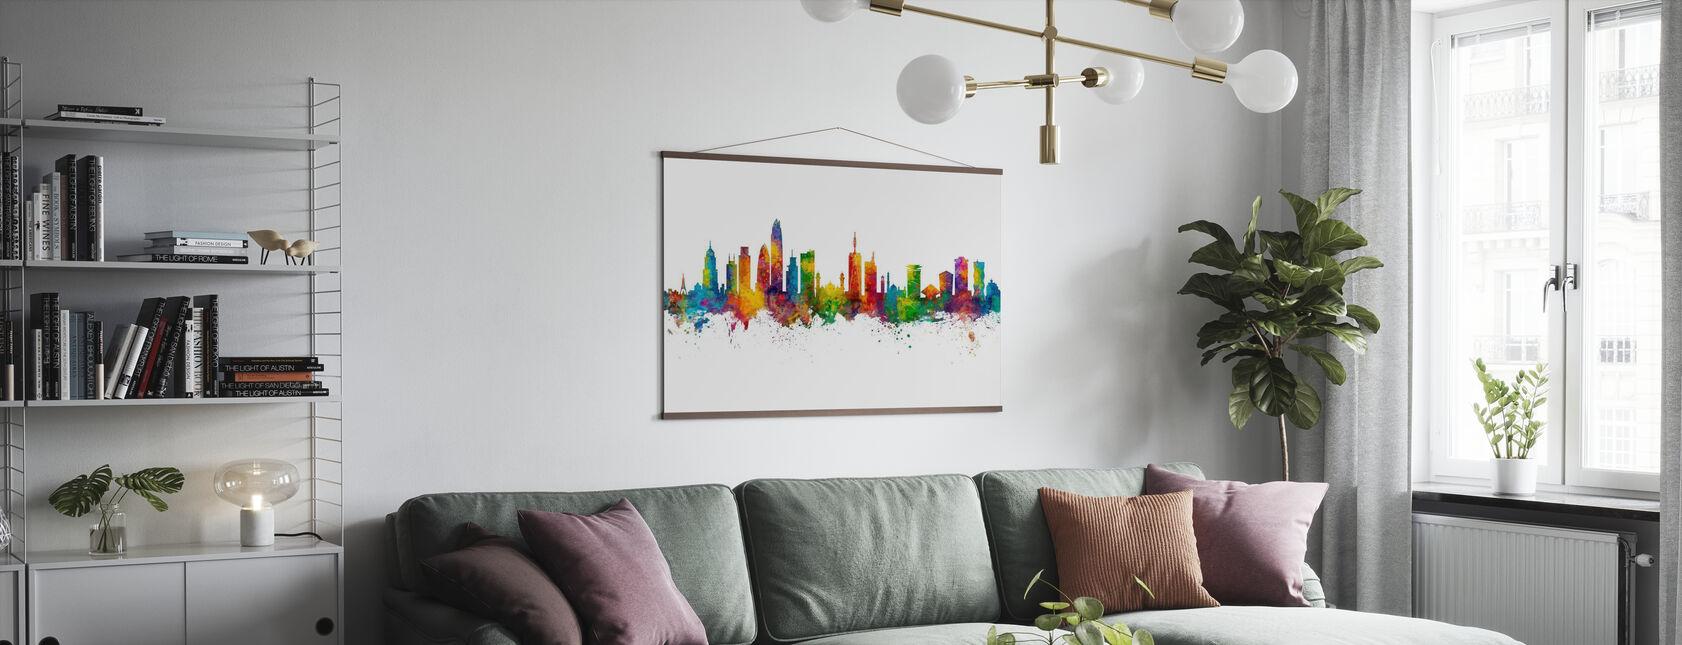 Nairobi Kenya Skyline - Plakat - Stue